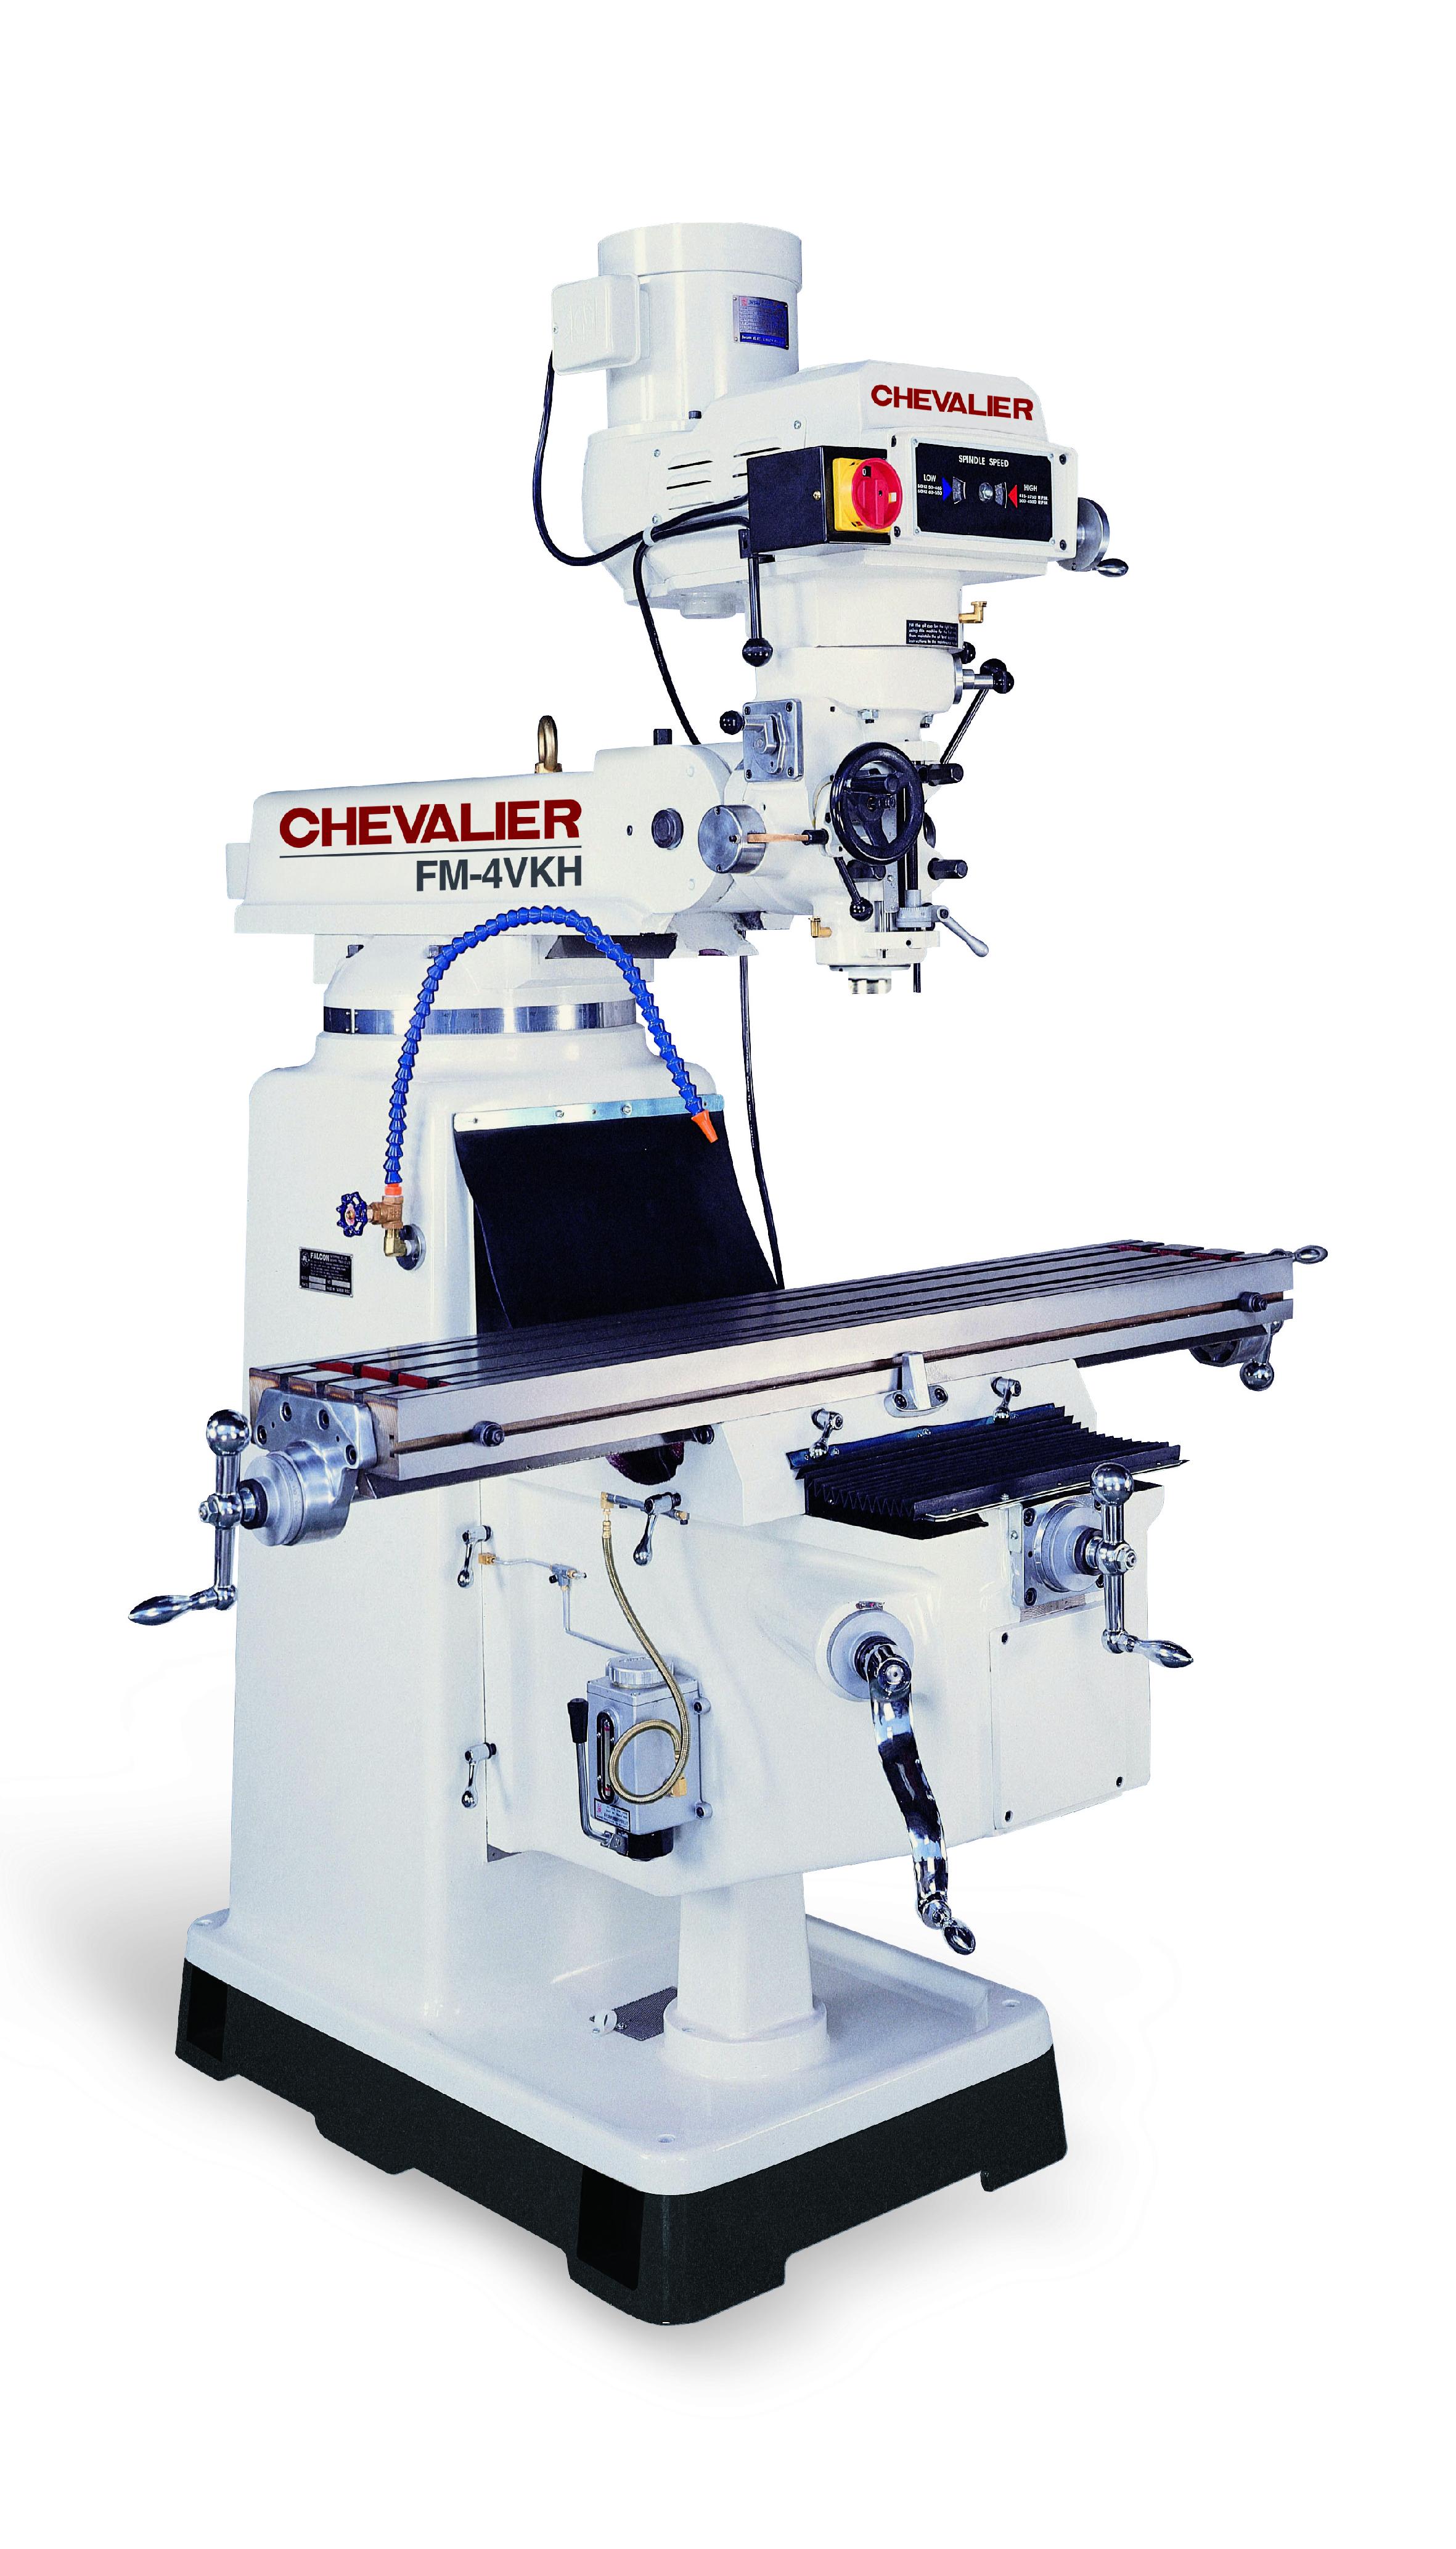 Chevalier fm4-vkh